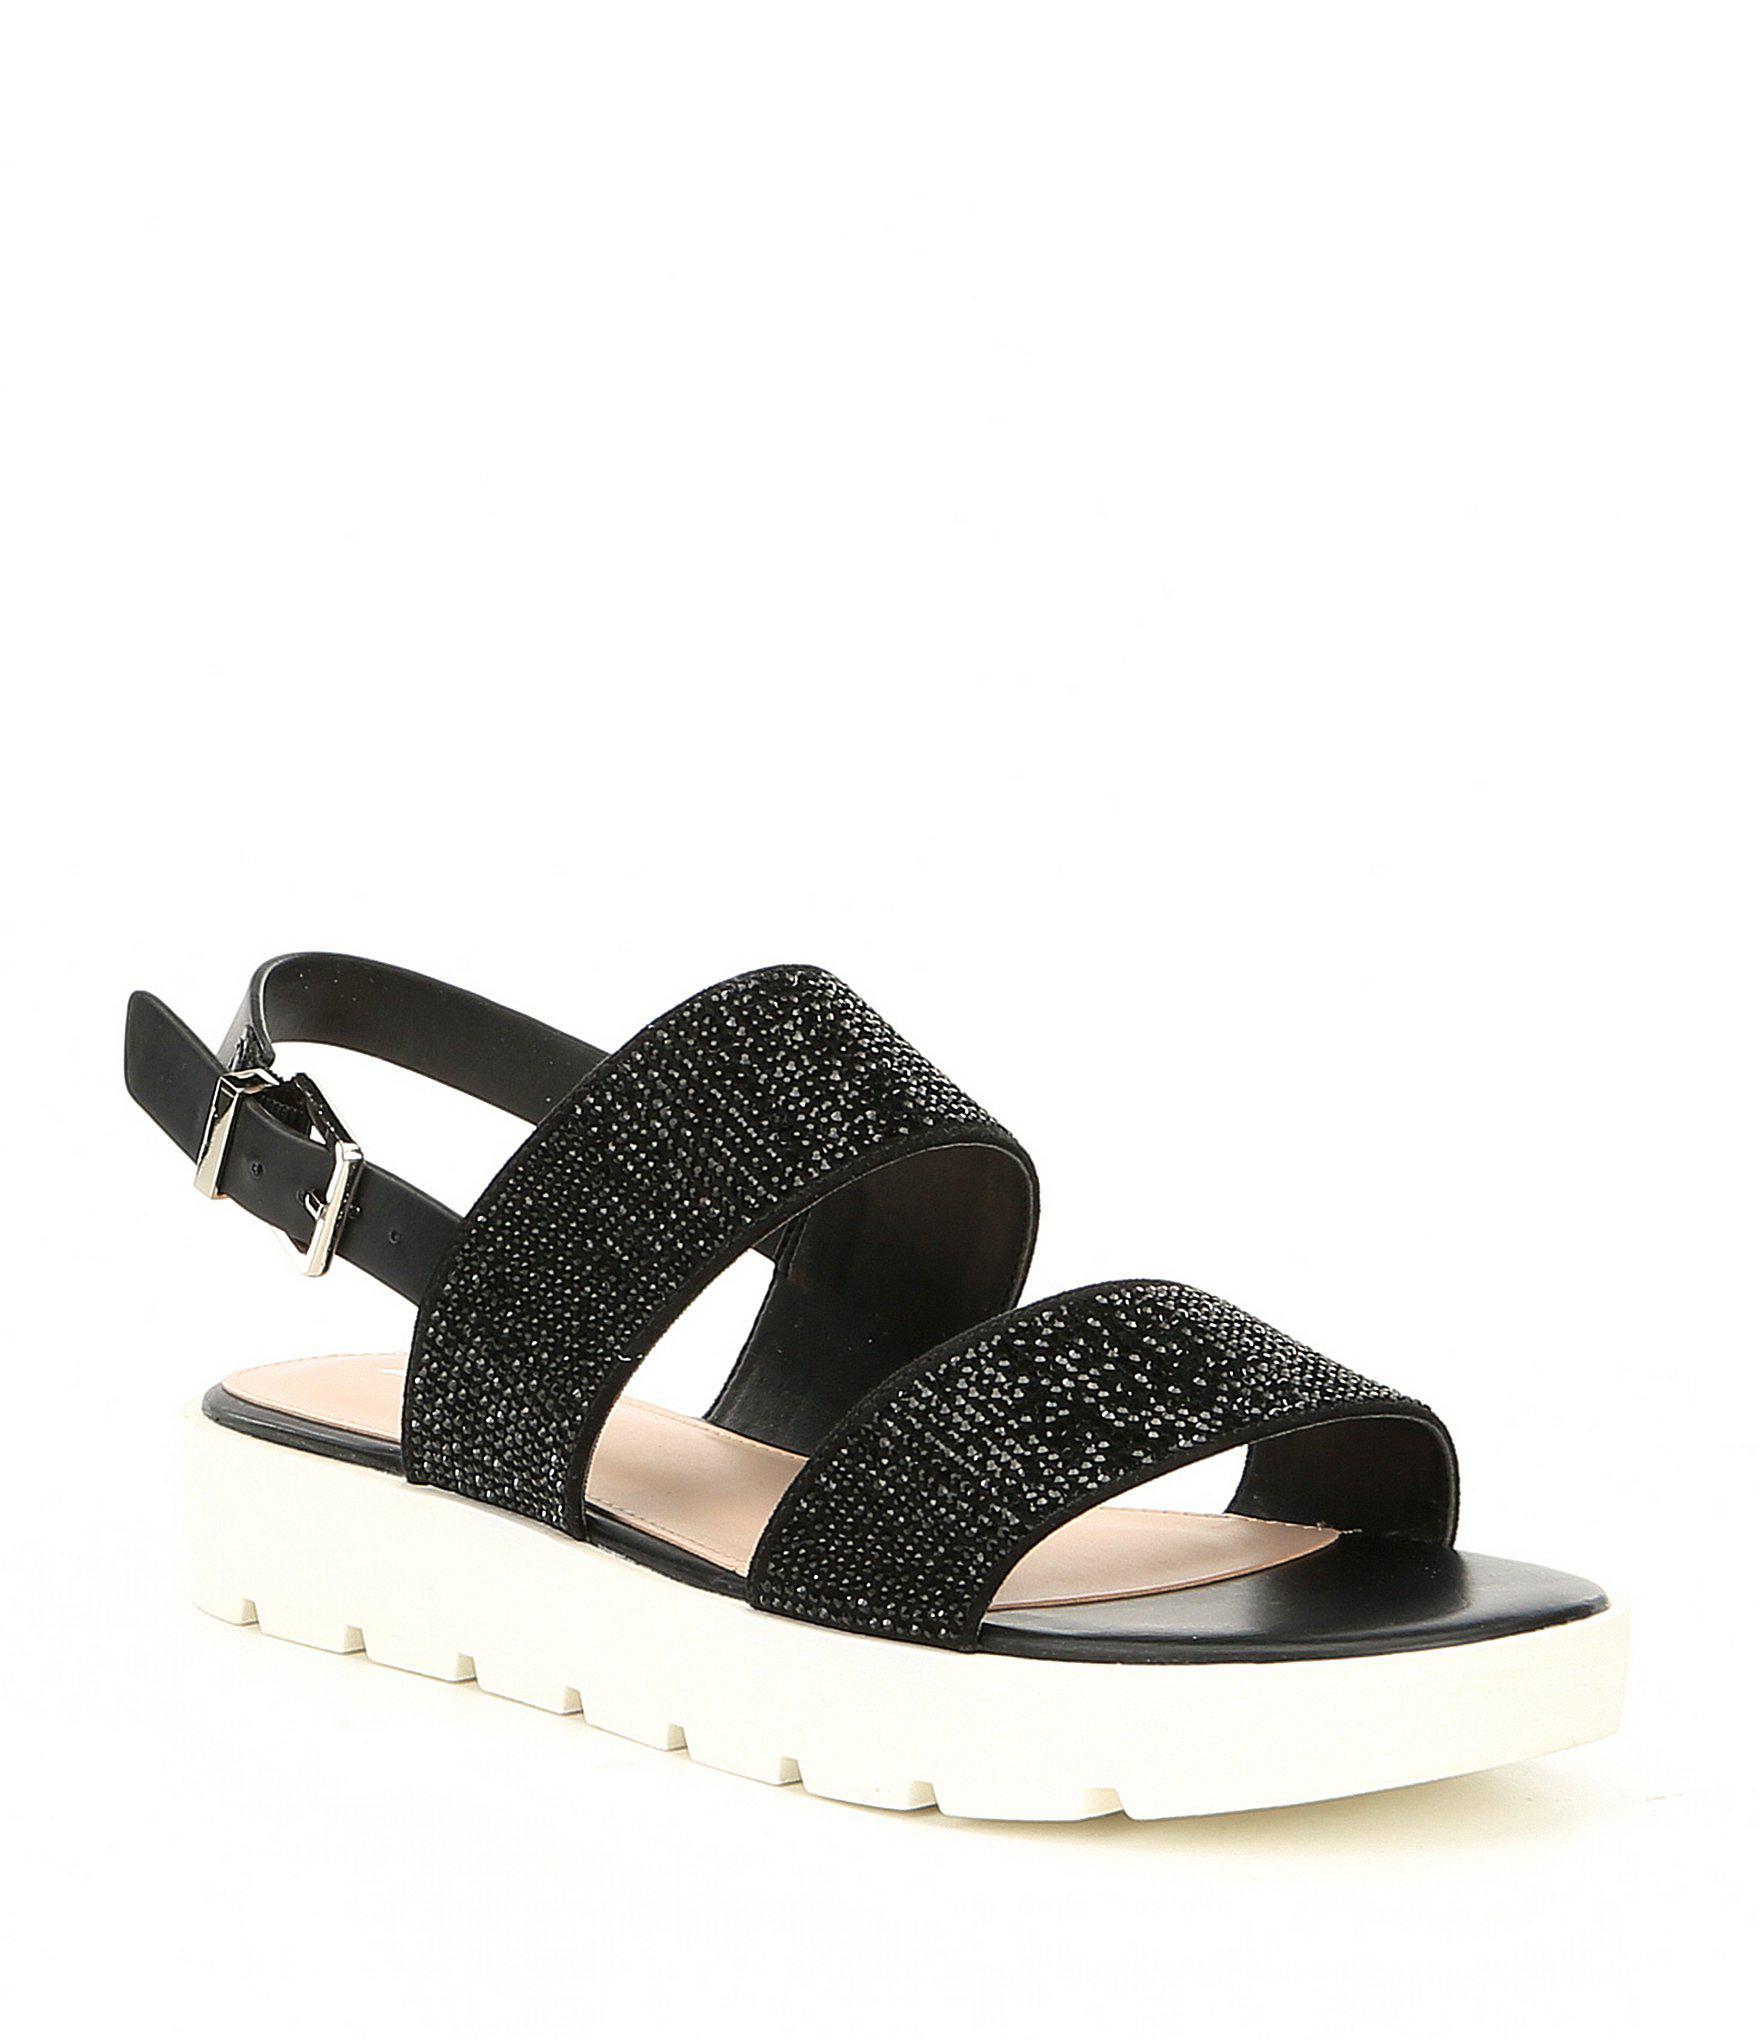 97d0668bfd10 Lyst - ALDO Eliraviel Flatform Sandals in Black